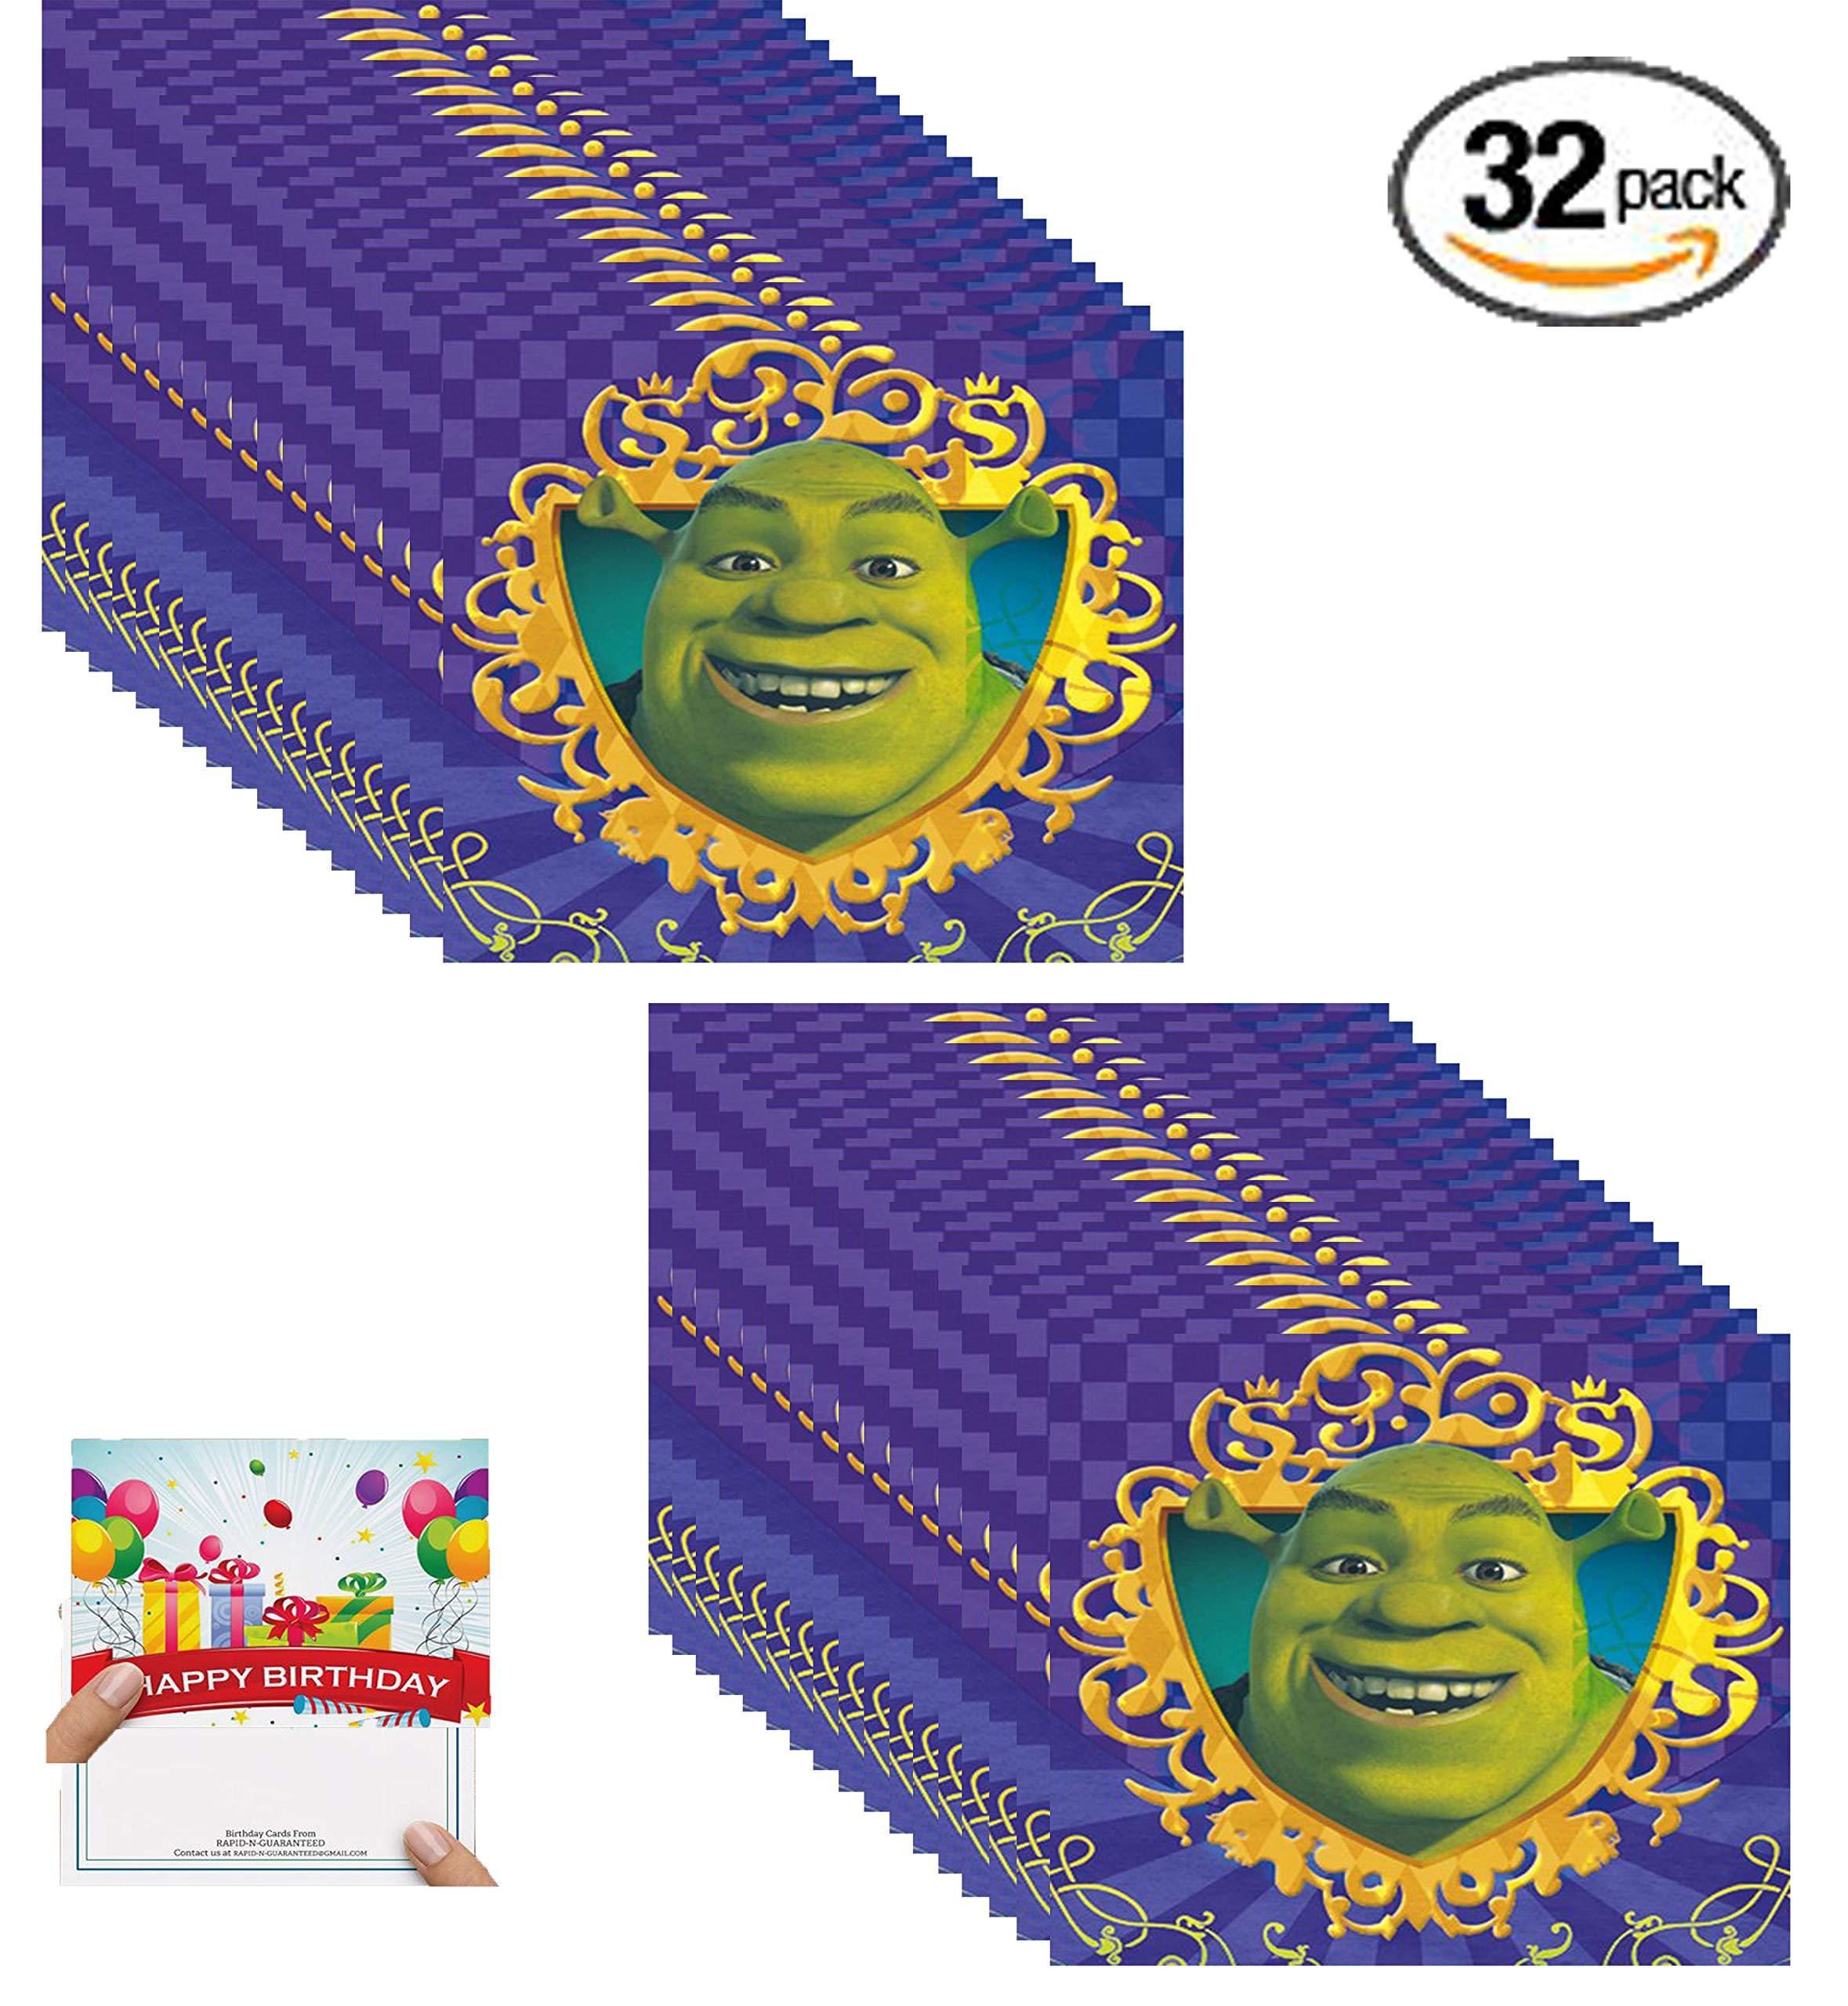 Shrek Party Supplies Beverage Dessert Cake Napkins With Birthday Card Serves 32 Guests